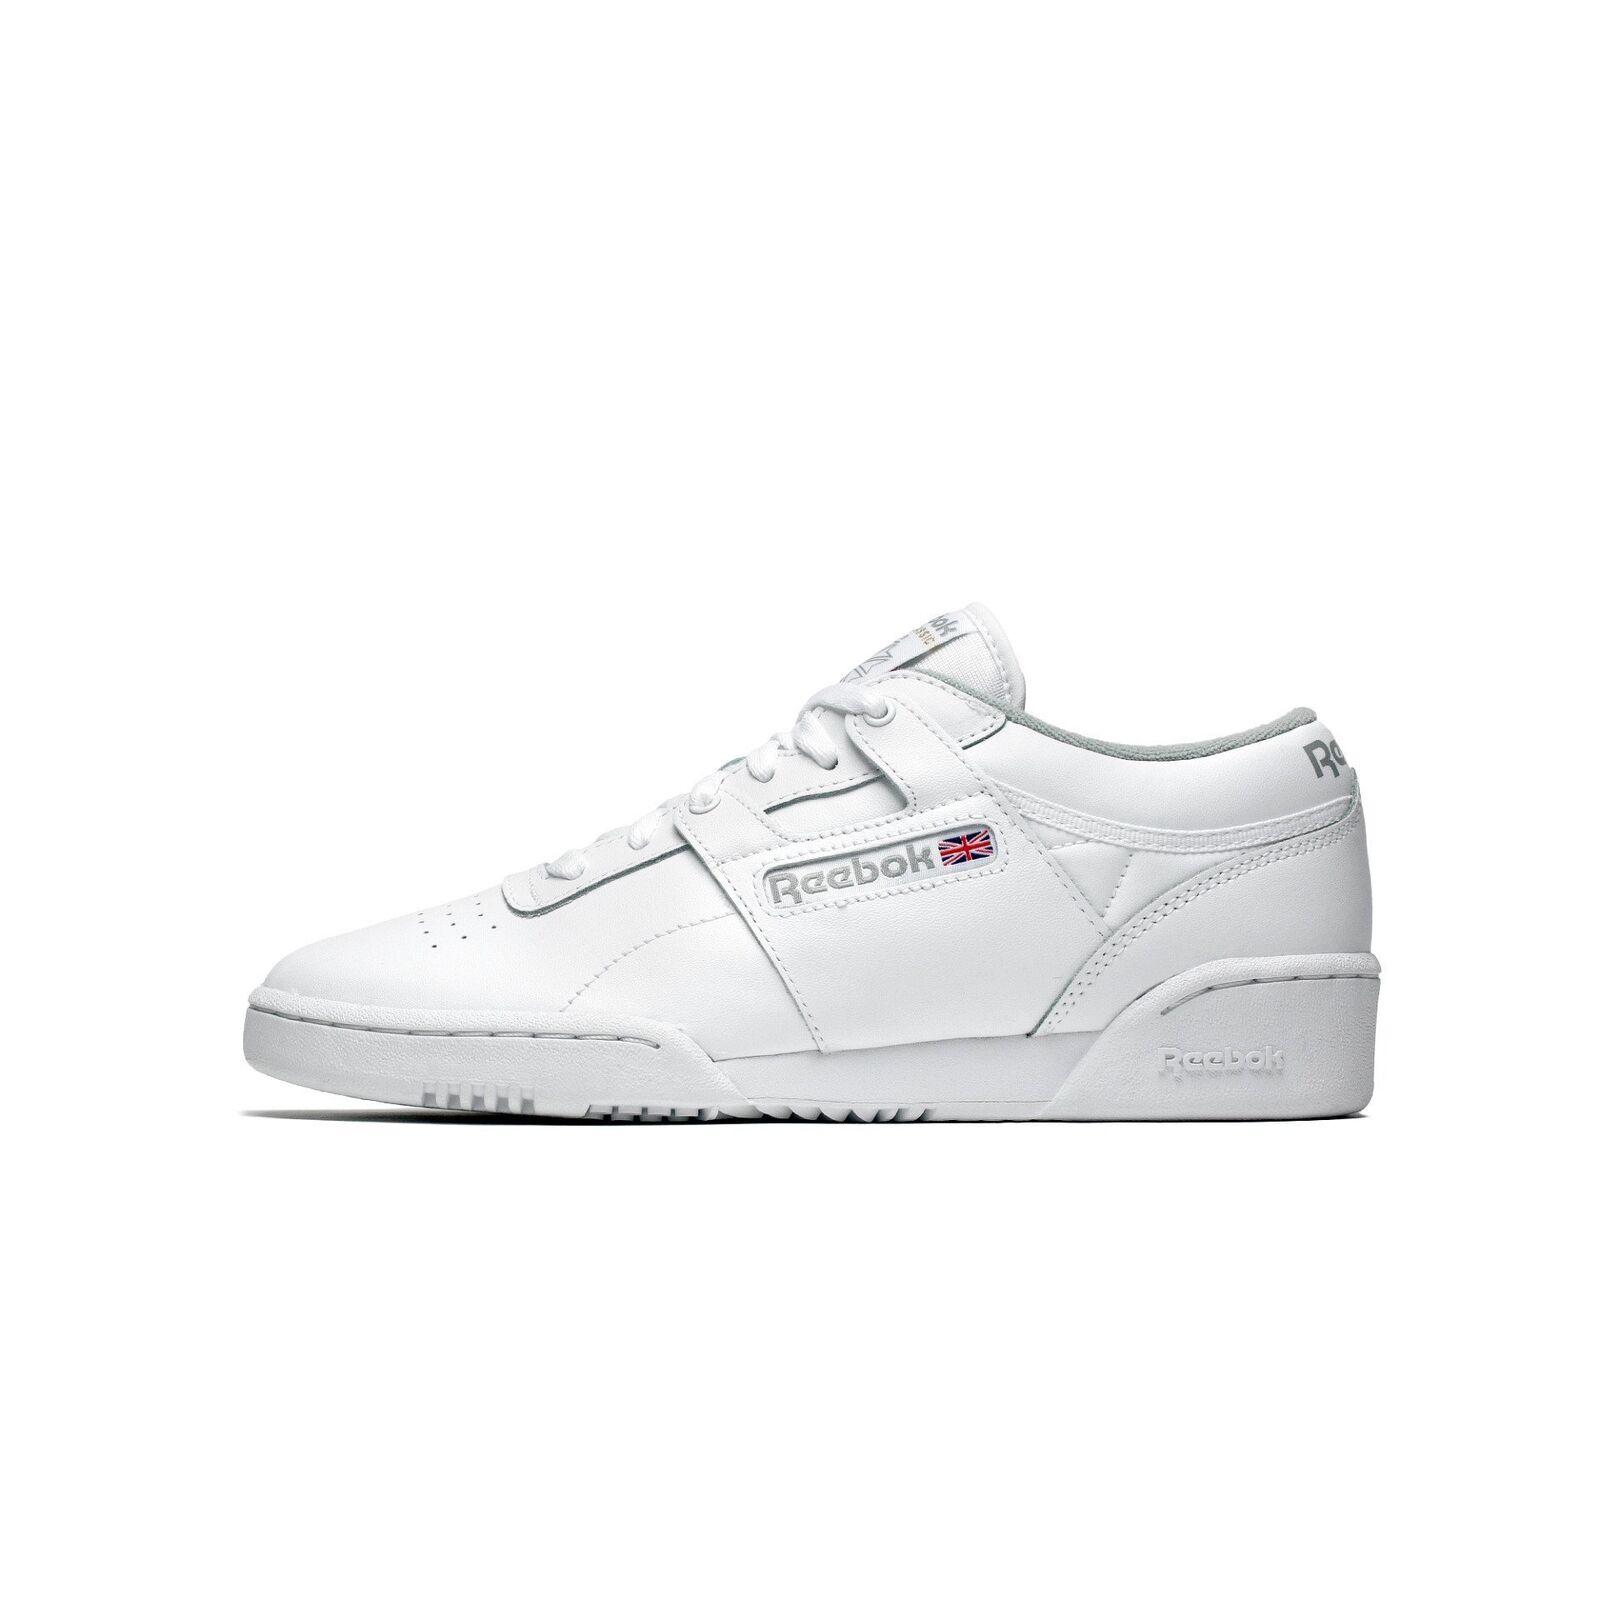 Mens Reebok Workout Low Weiß grau CN0636